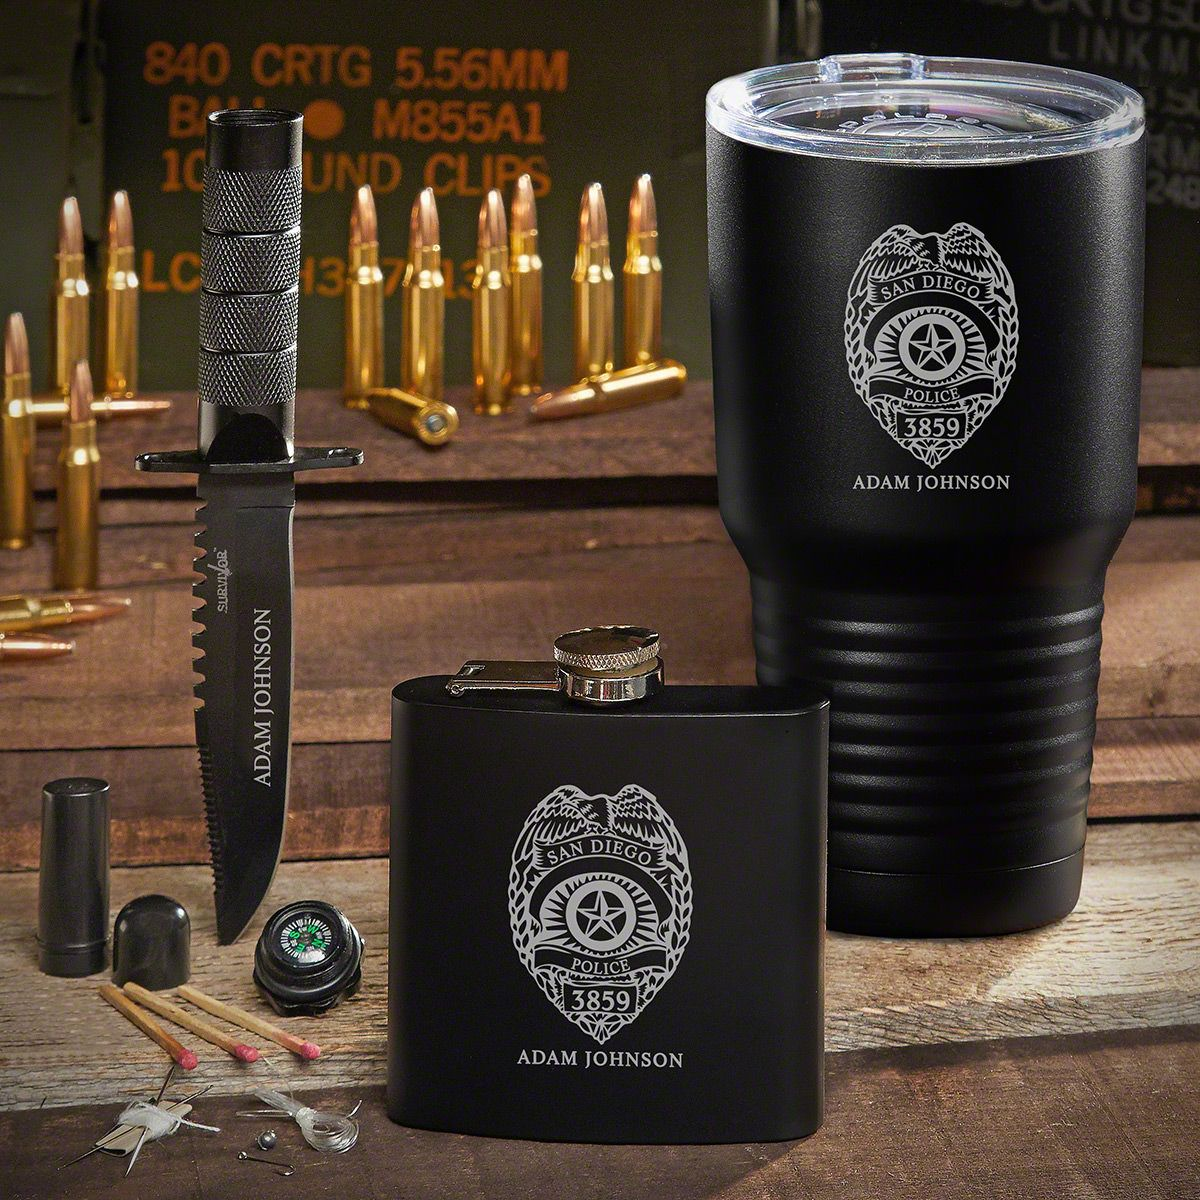 Spec Ops Police Badge Engraved Tumbler Set of Police Gifts